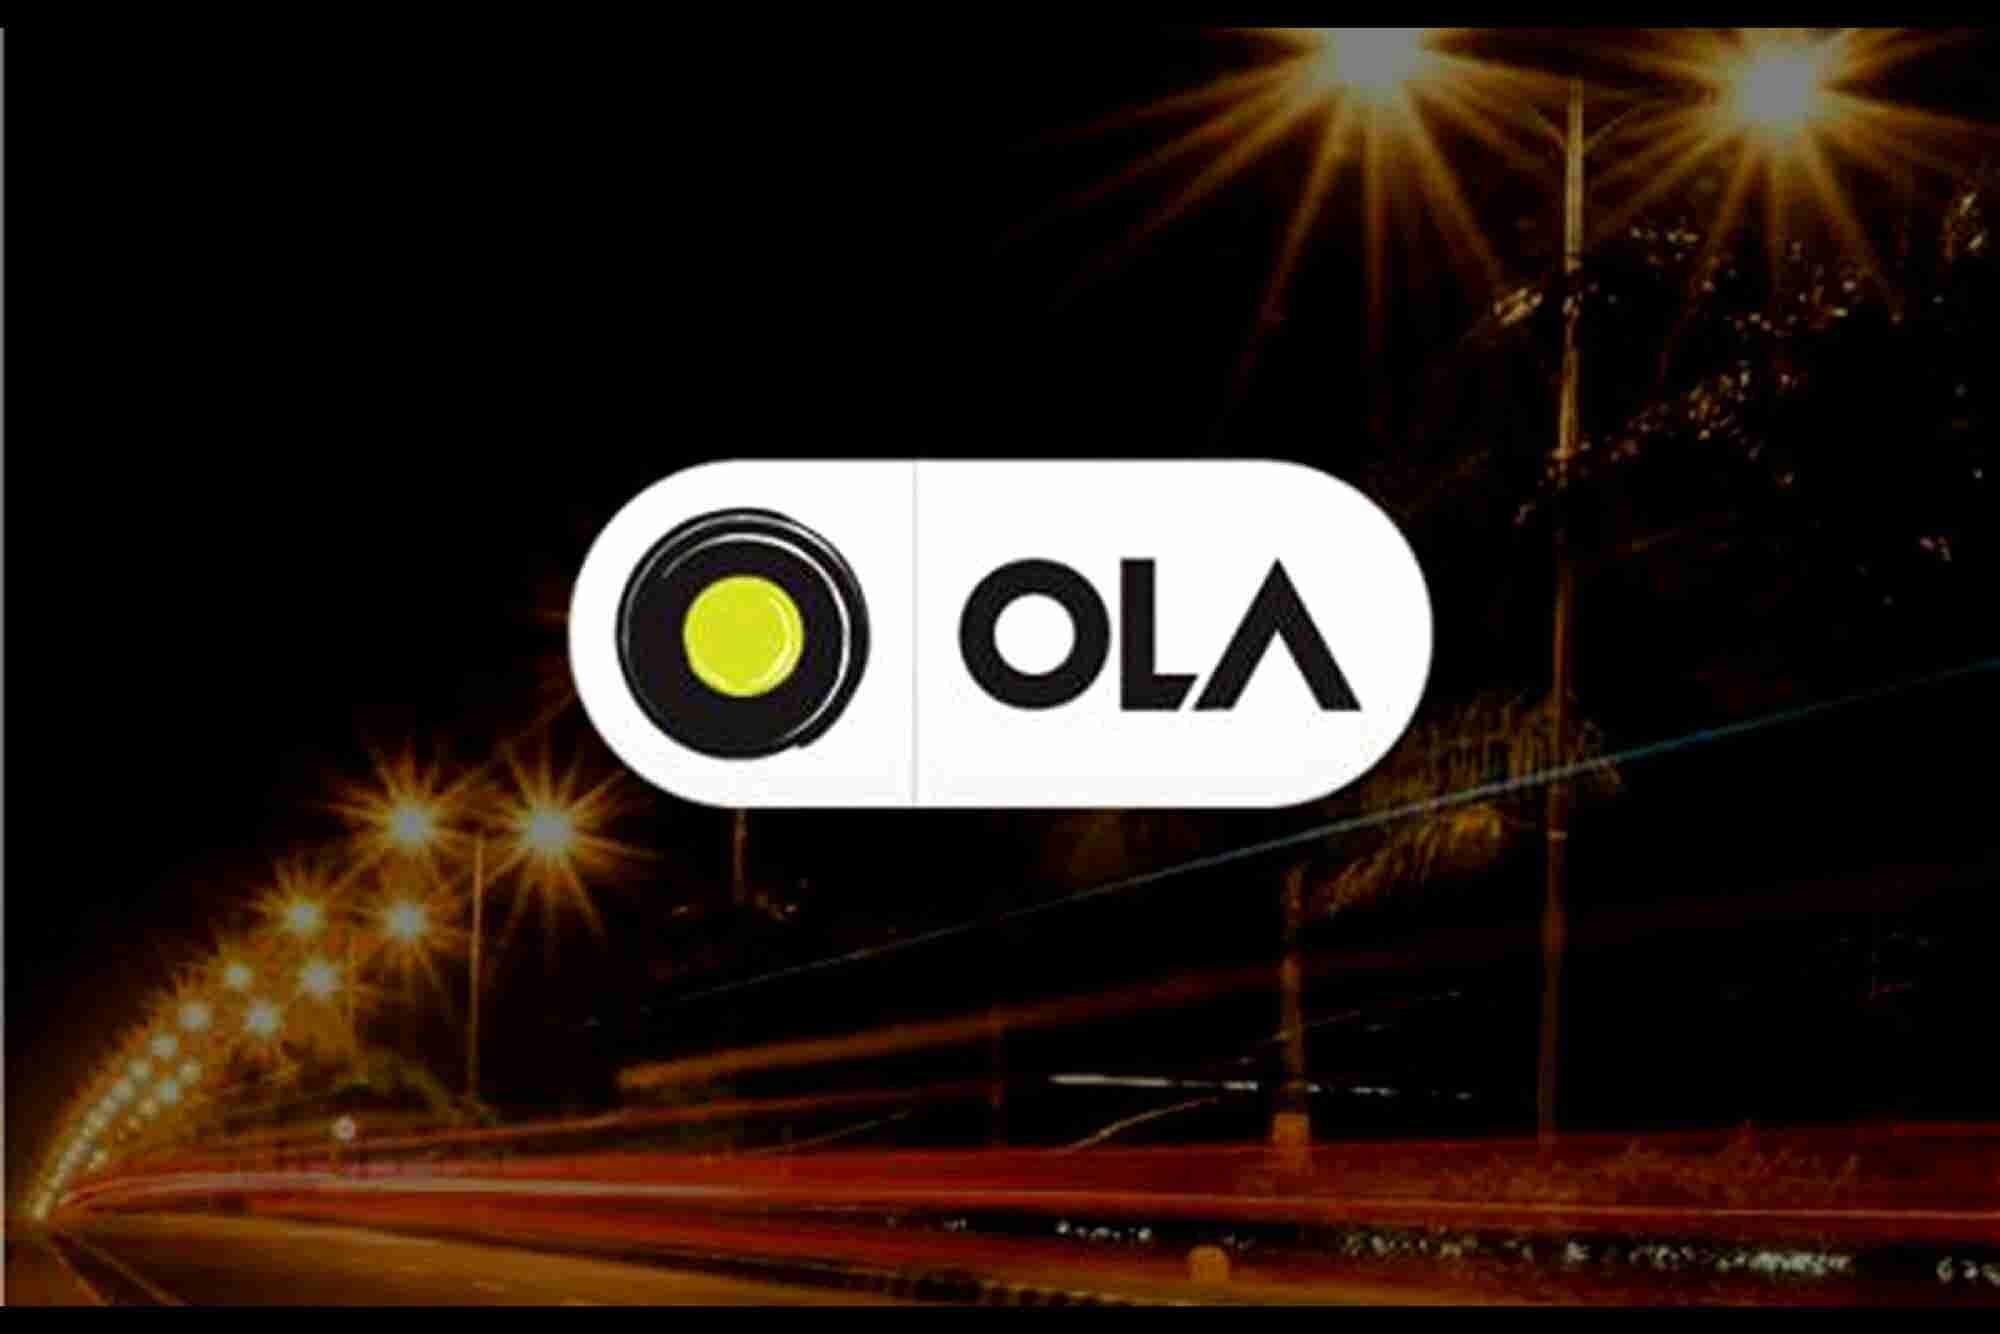 In Partnership With BMC, Ola Launches 5,100 E-Rickshaws